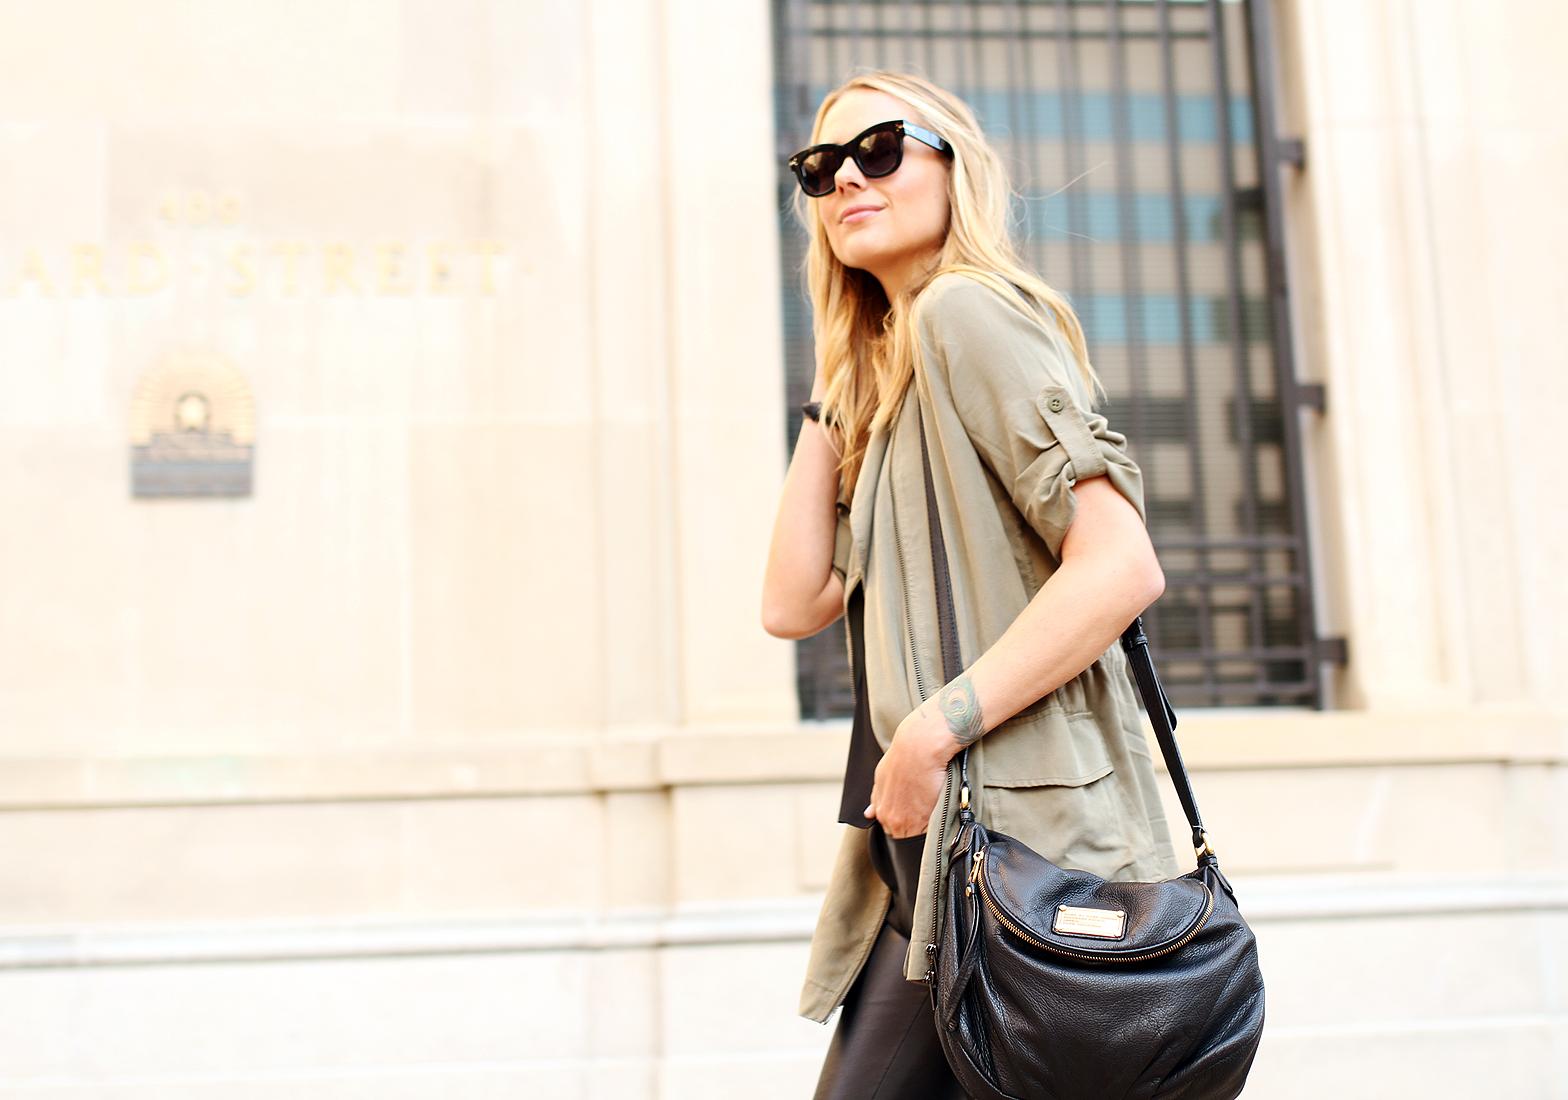 fashion-jackson-banana-republic-drapey-drawstring-jacket-black-celine-sunglasses